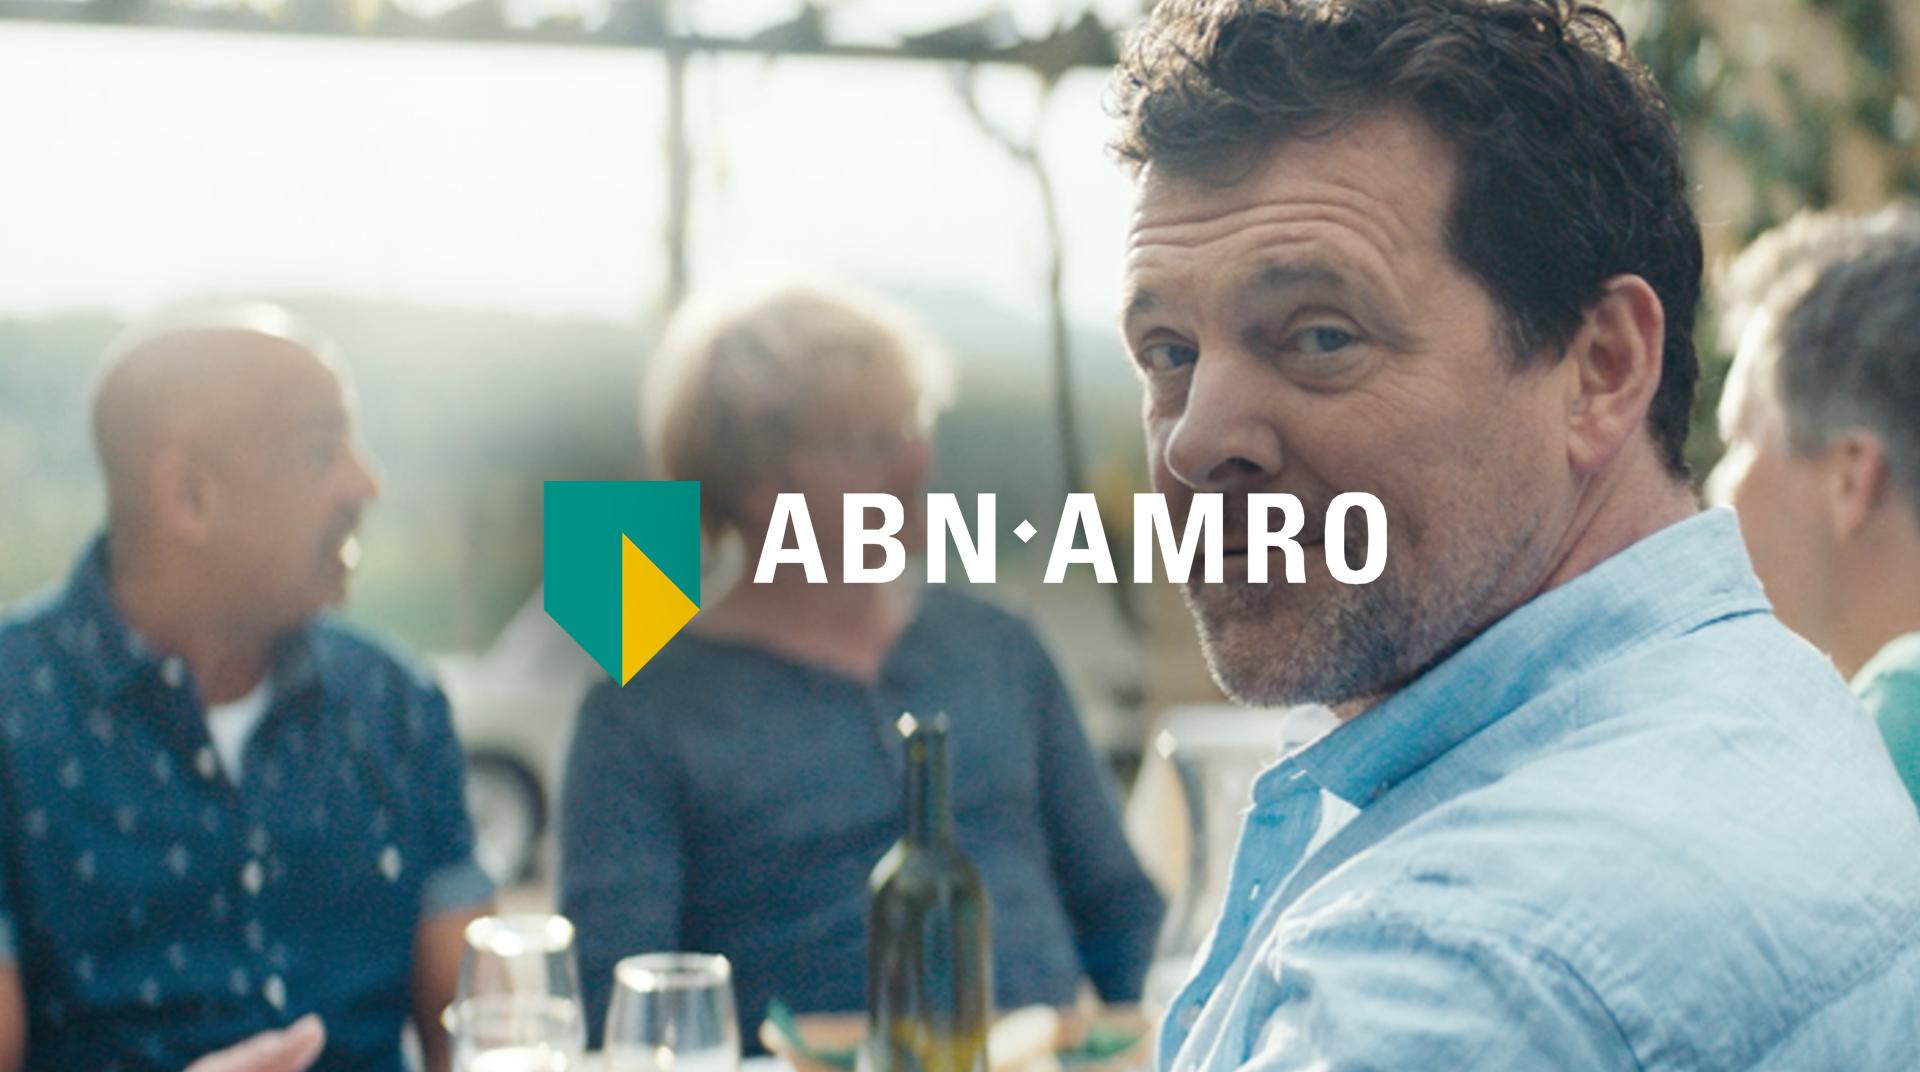 ABN AMRO | Bankbrede gesegmenteerde email marketing en marketing automation